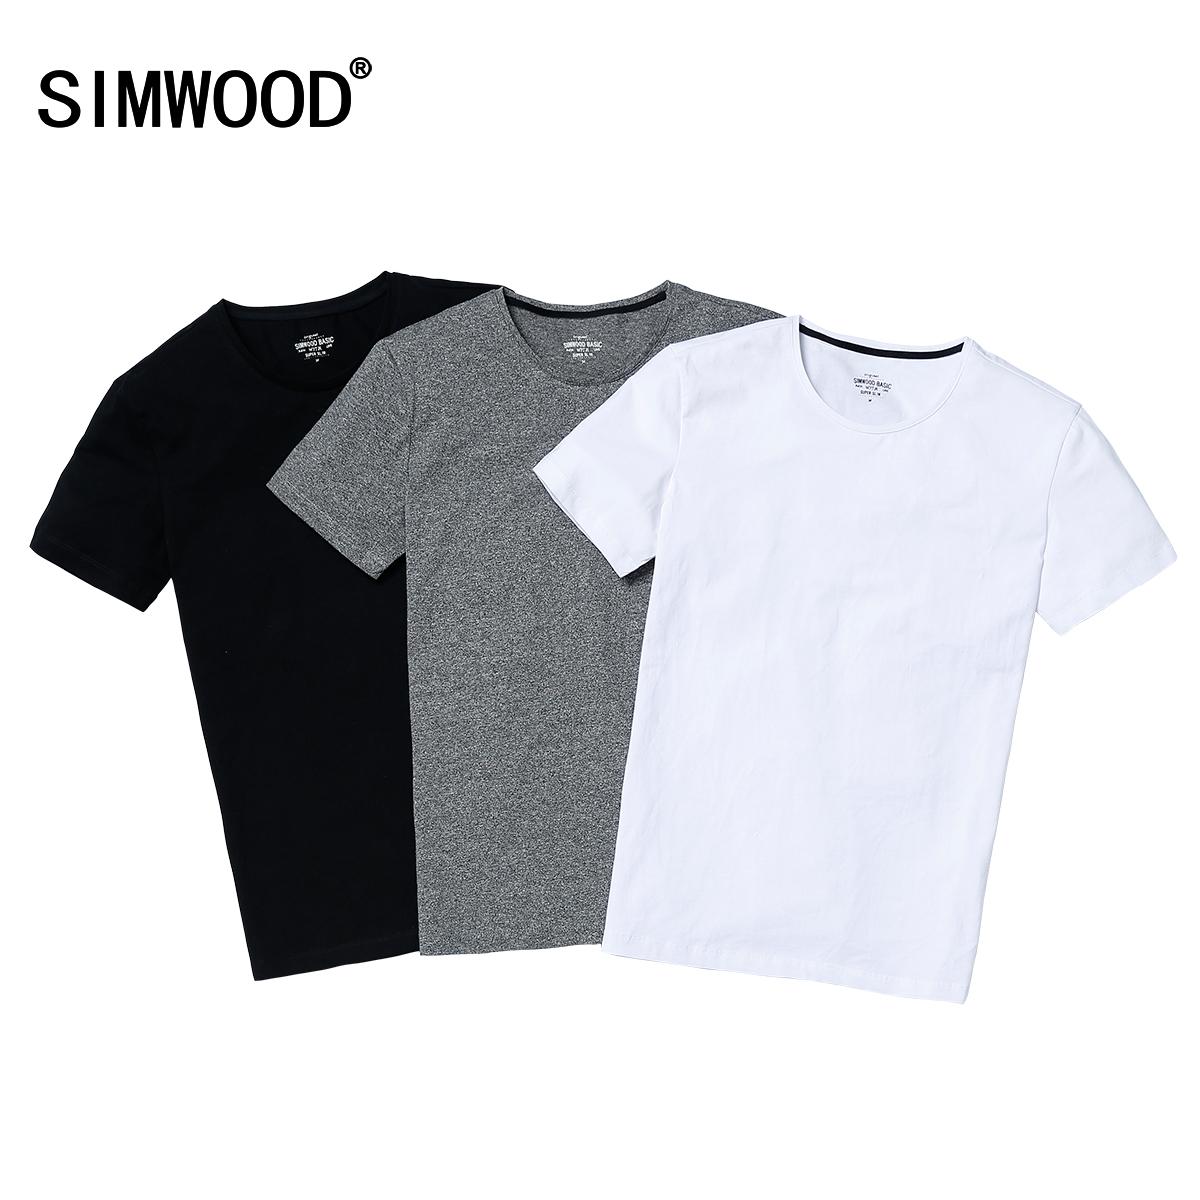 simwood 純棉圓領短t